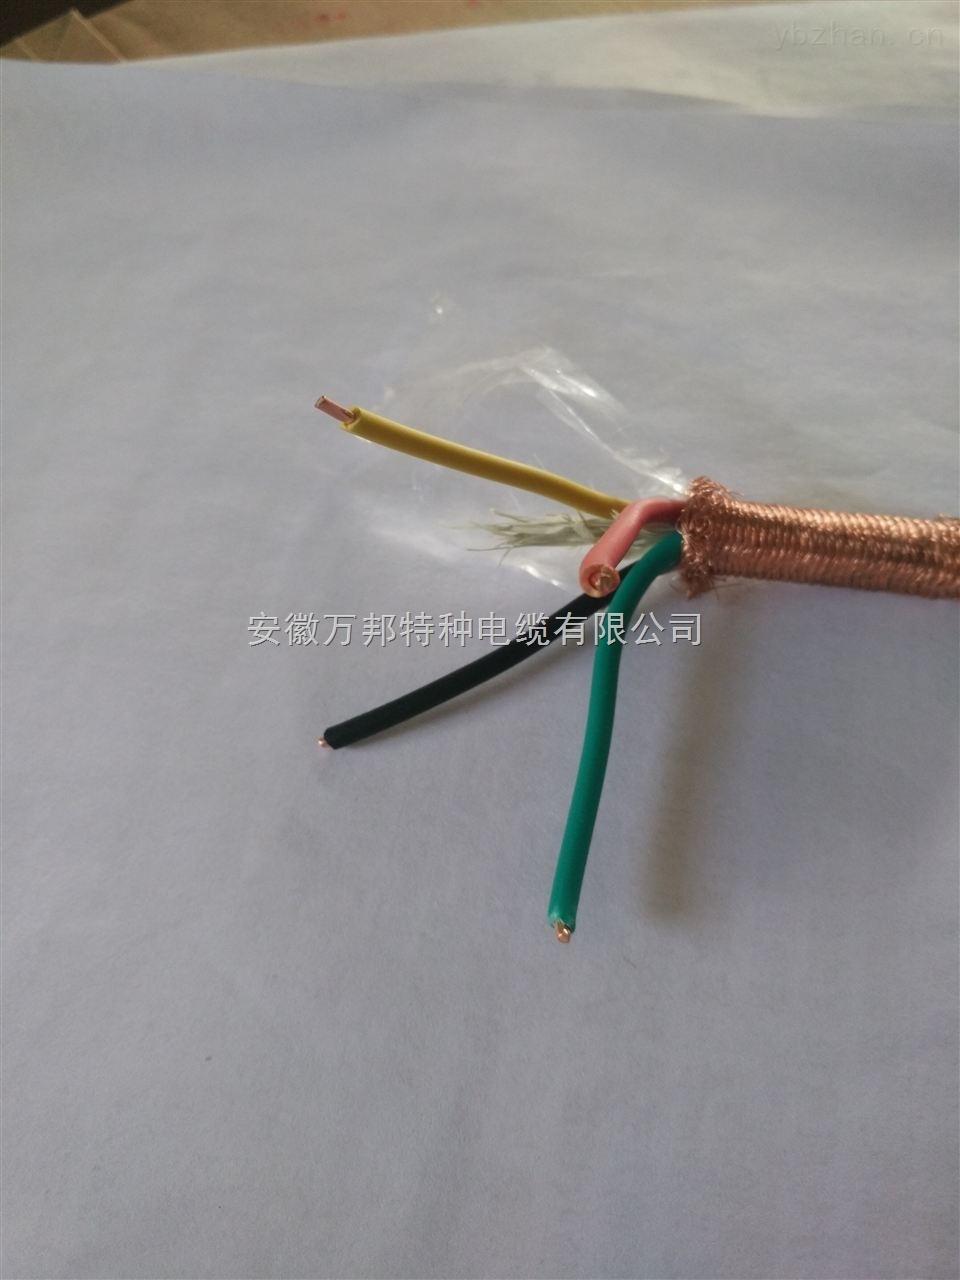 KHFRP 耐油耐高温电缆